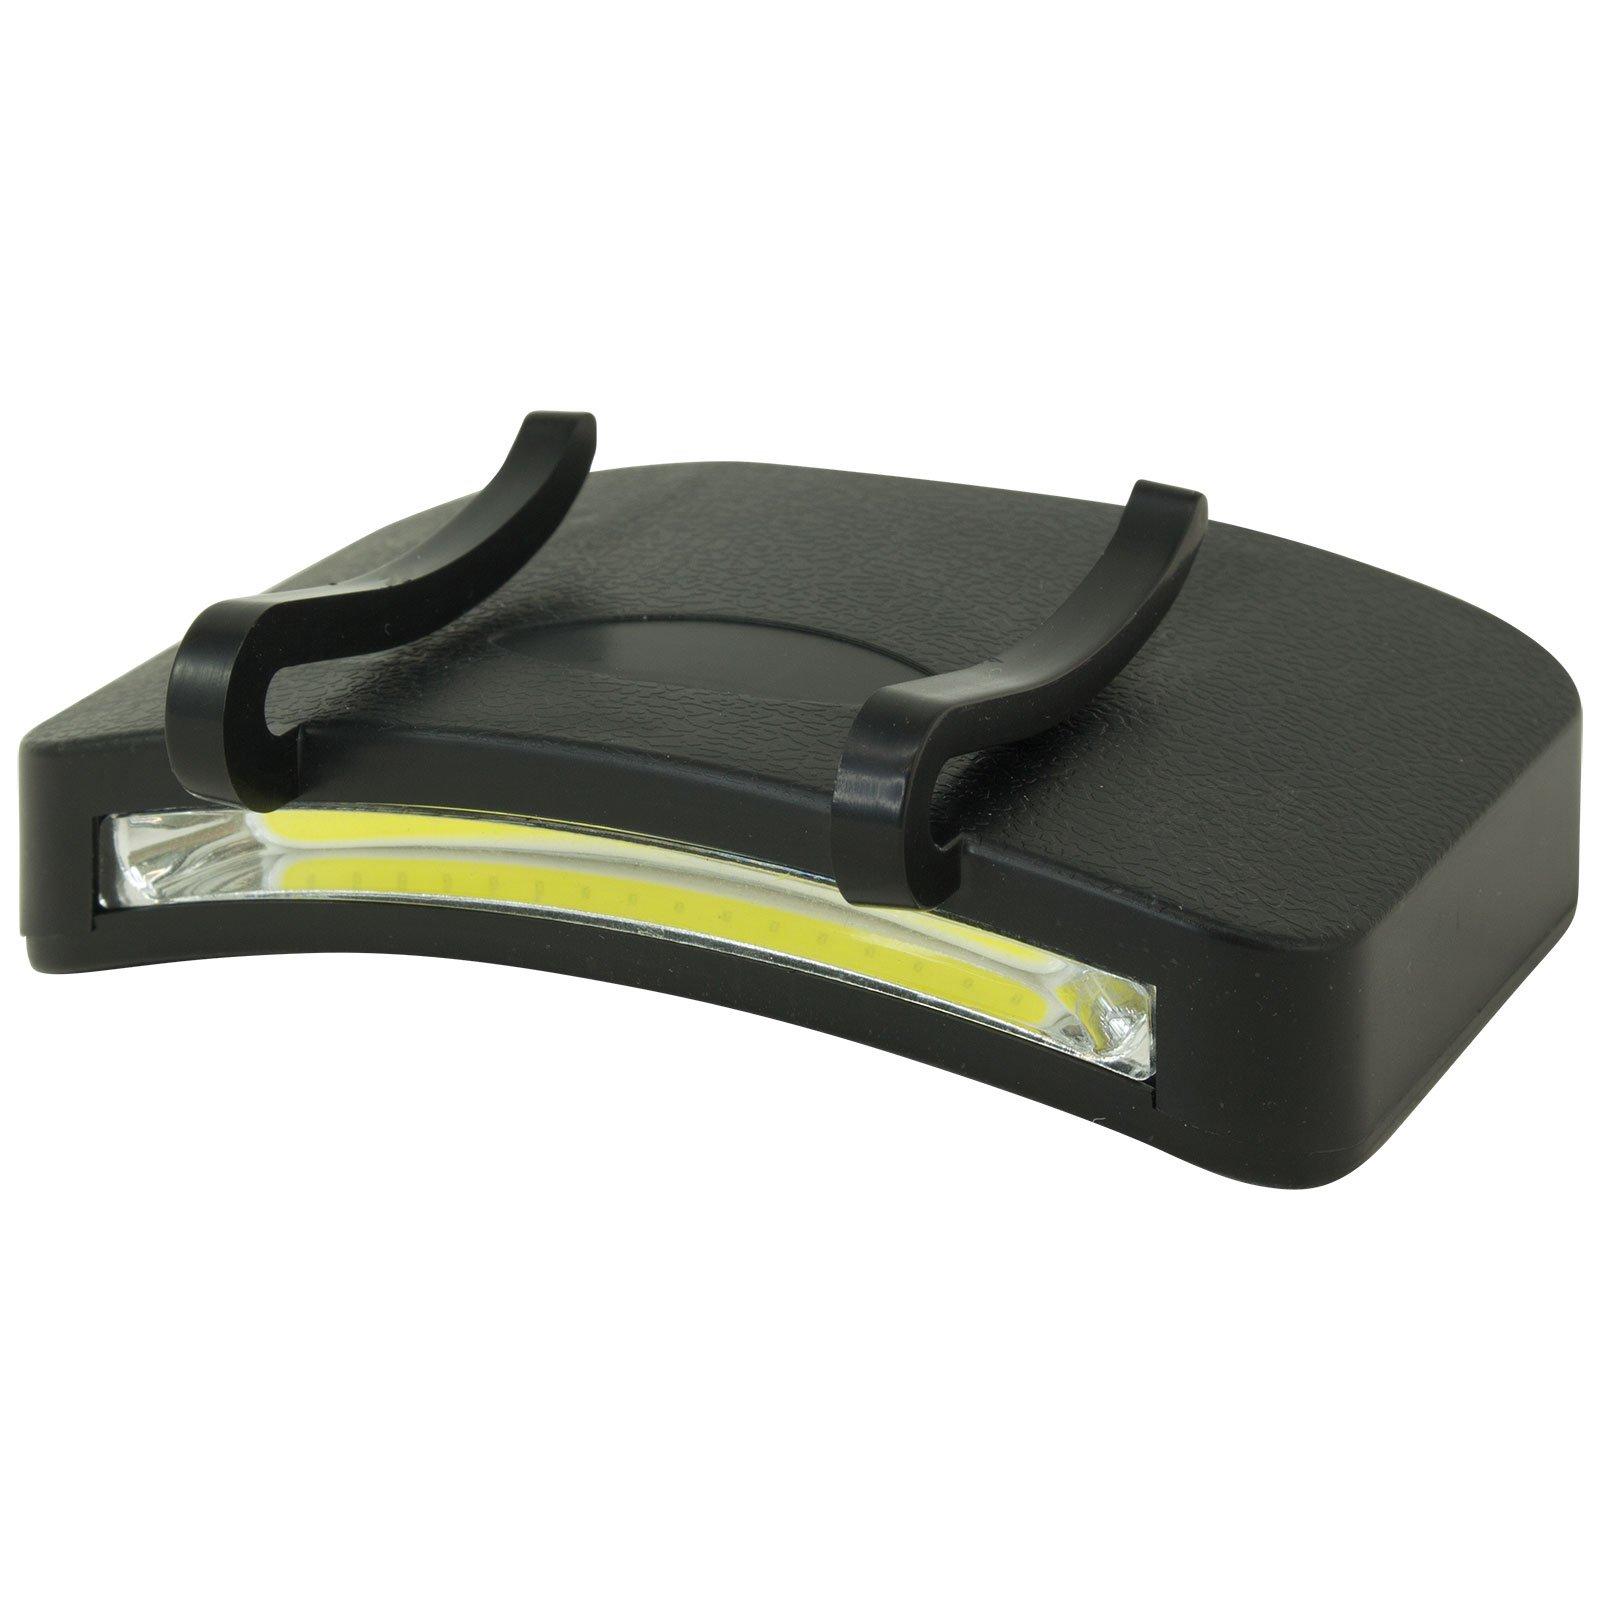 2 PACK - 400 Lumen Hi Mode / 180 Lumen Low Power Mode (2 X Cap Lights > 2 X Power & 2 X Bright) COB LED Clip On Cap Light DOUBLE BRIGHT (100% MFG Guarantee) (Black) by Apollo's Products (Image #2)